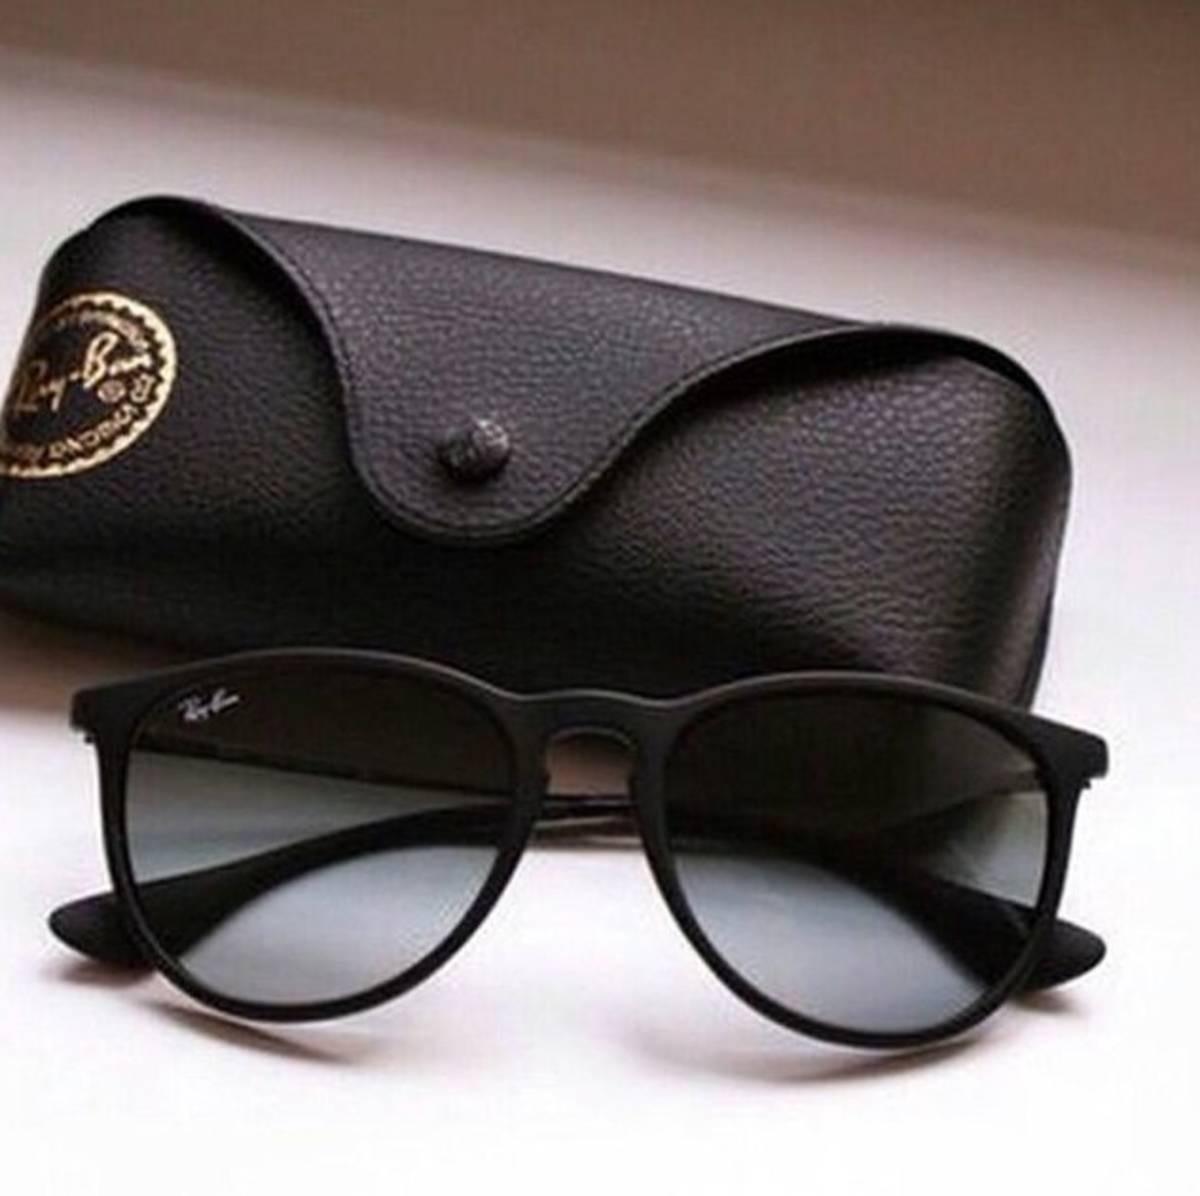 ff89ebe5e933c óculos de sol ray ban erika rb4171 gatinha preto feminino. Carregando zoom.